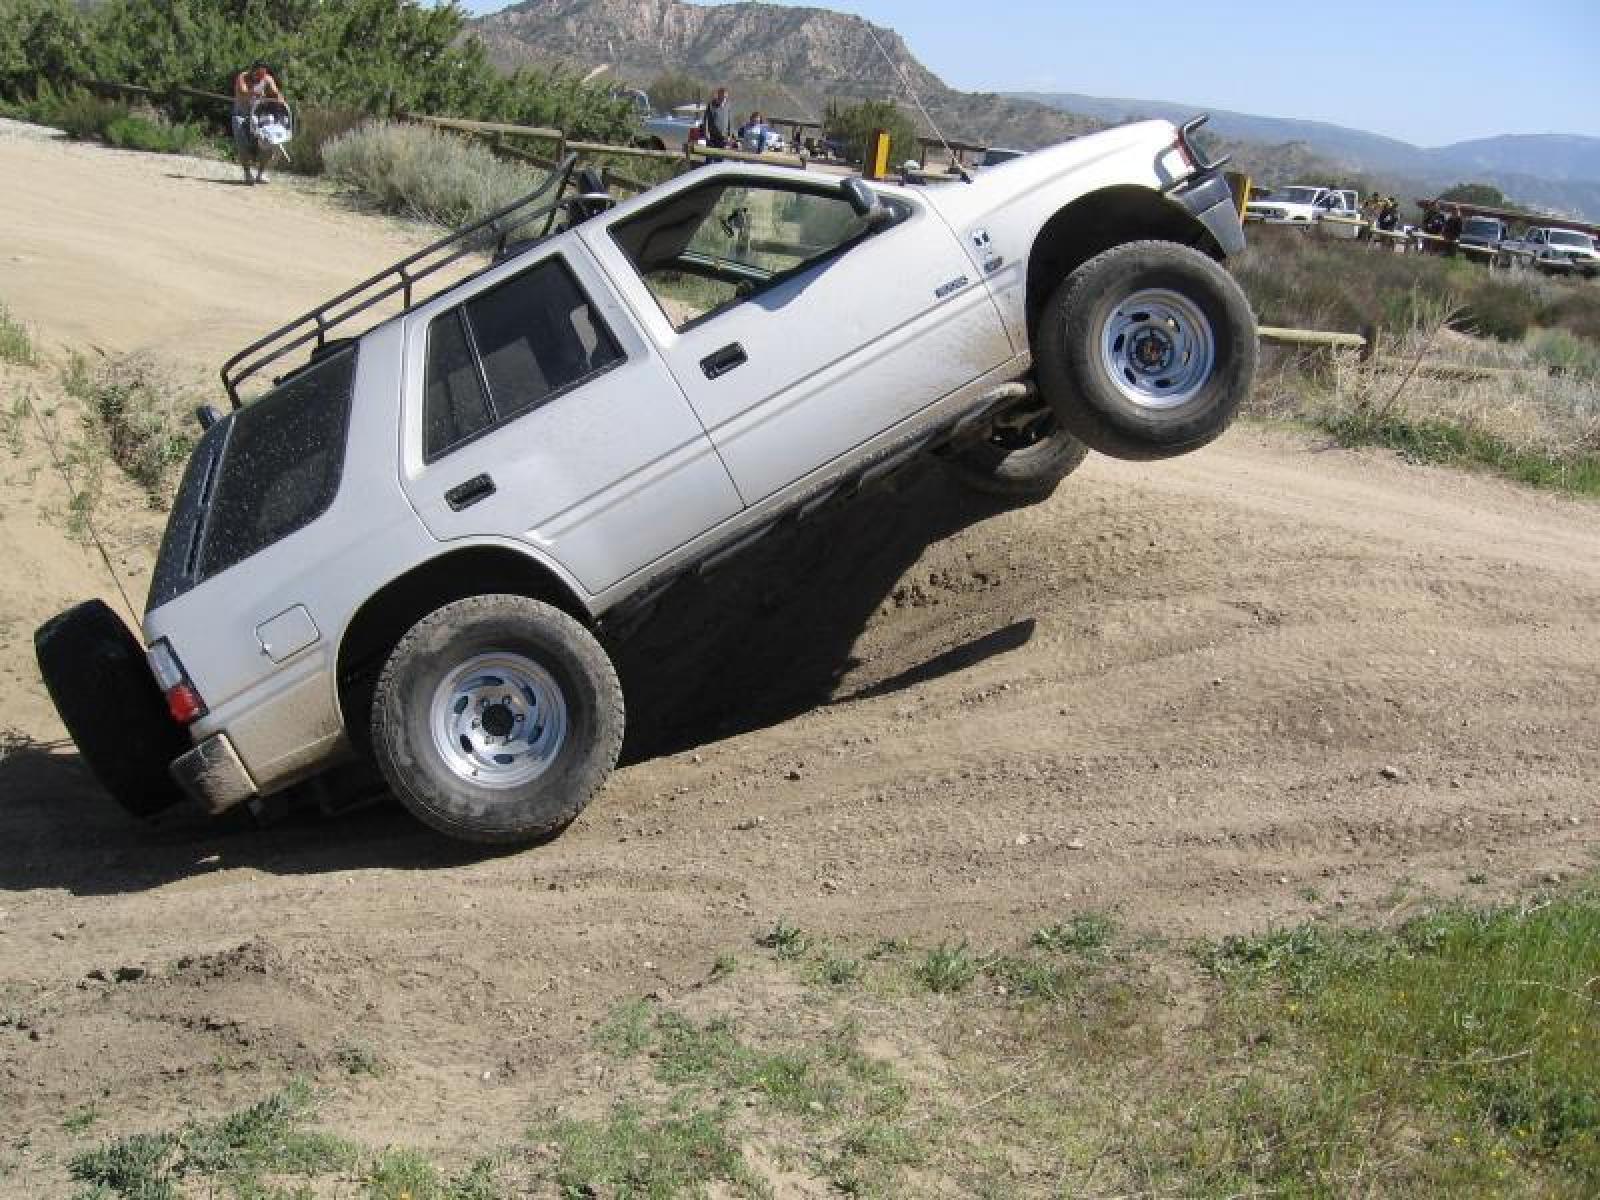 1997 Isuzu Rodeo - Information and photos - Zomb Drive